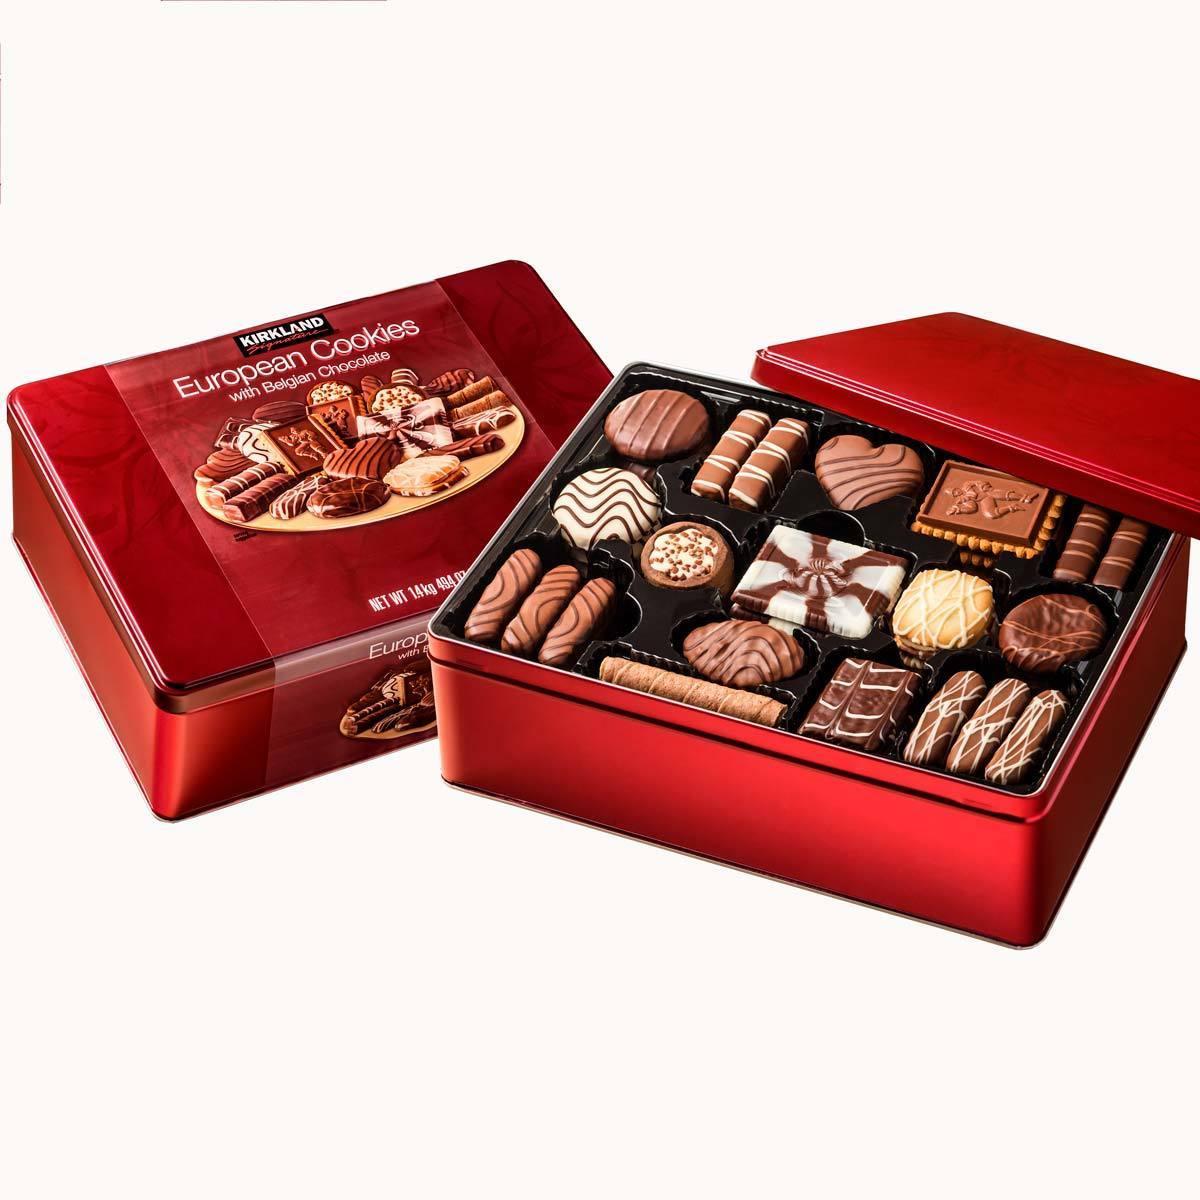 Kirkland Signature 1 4kg European Cookies With Belgian Chocolate